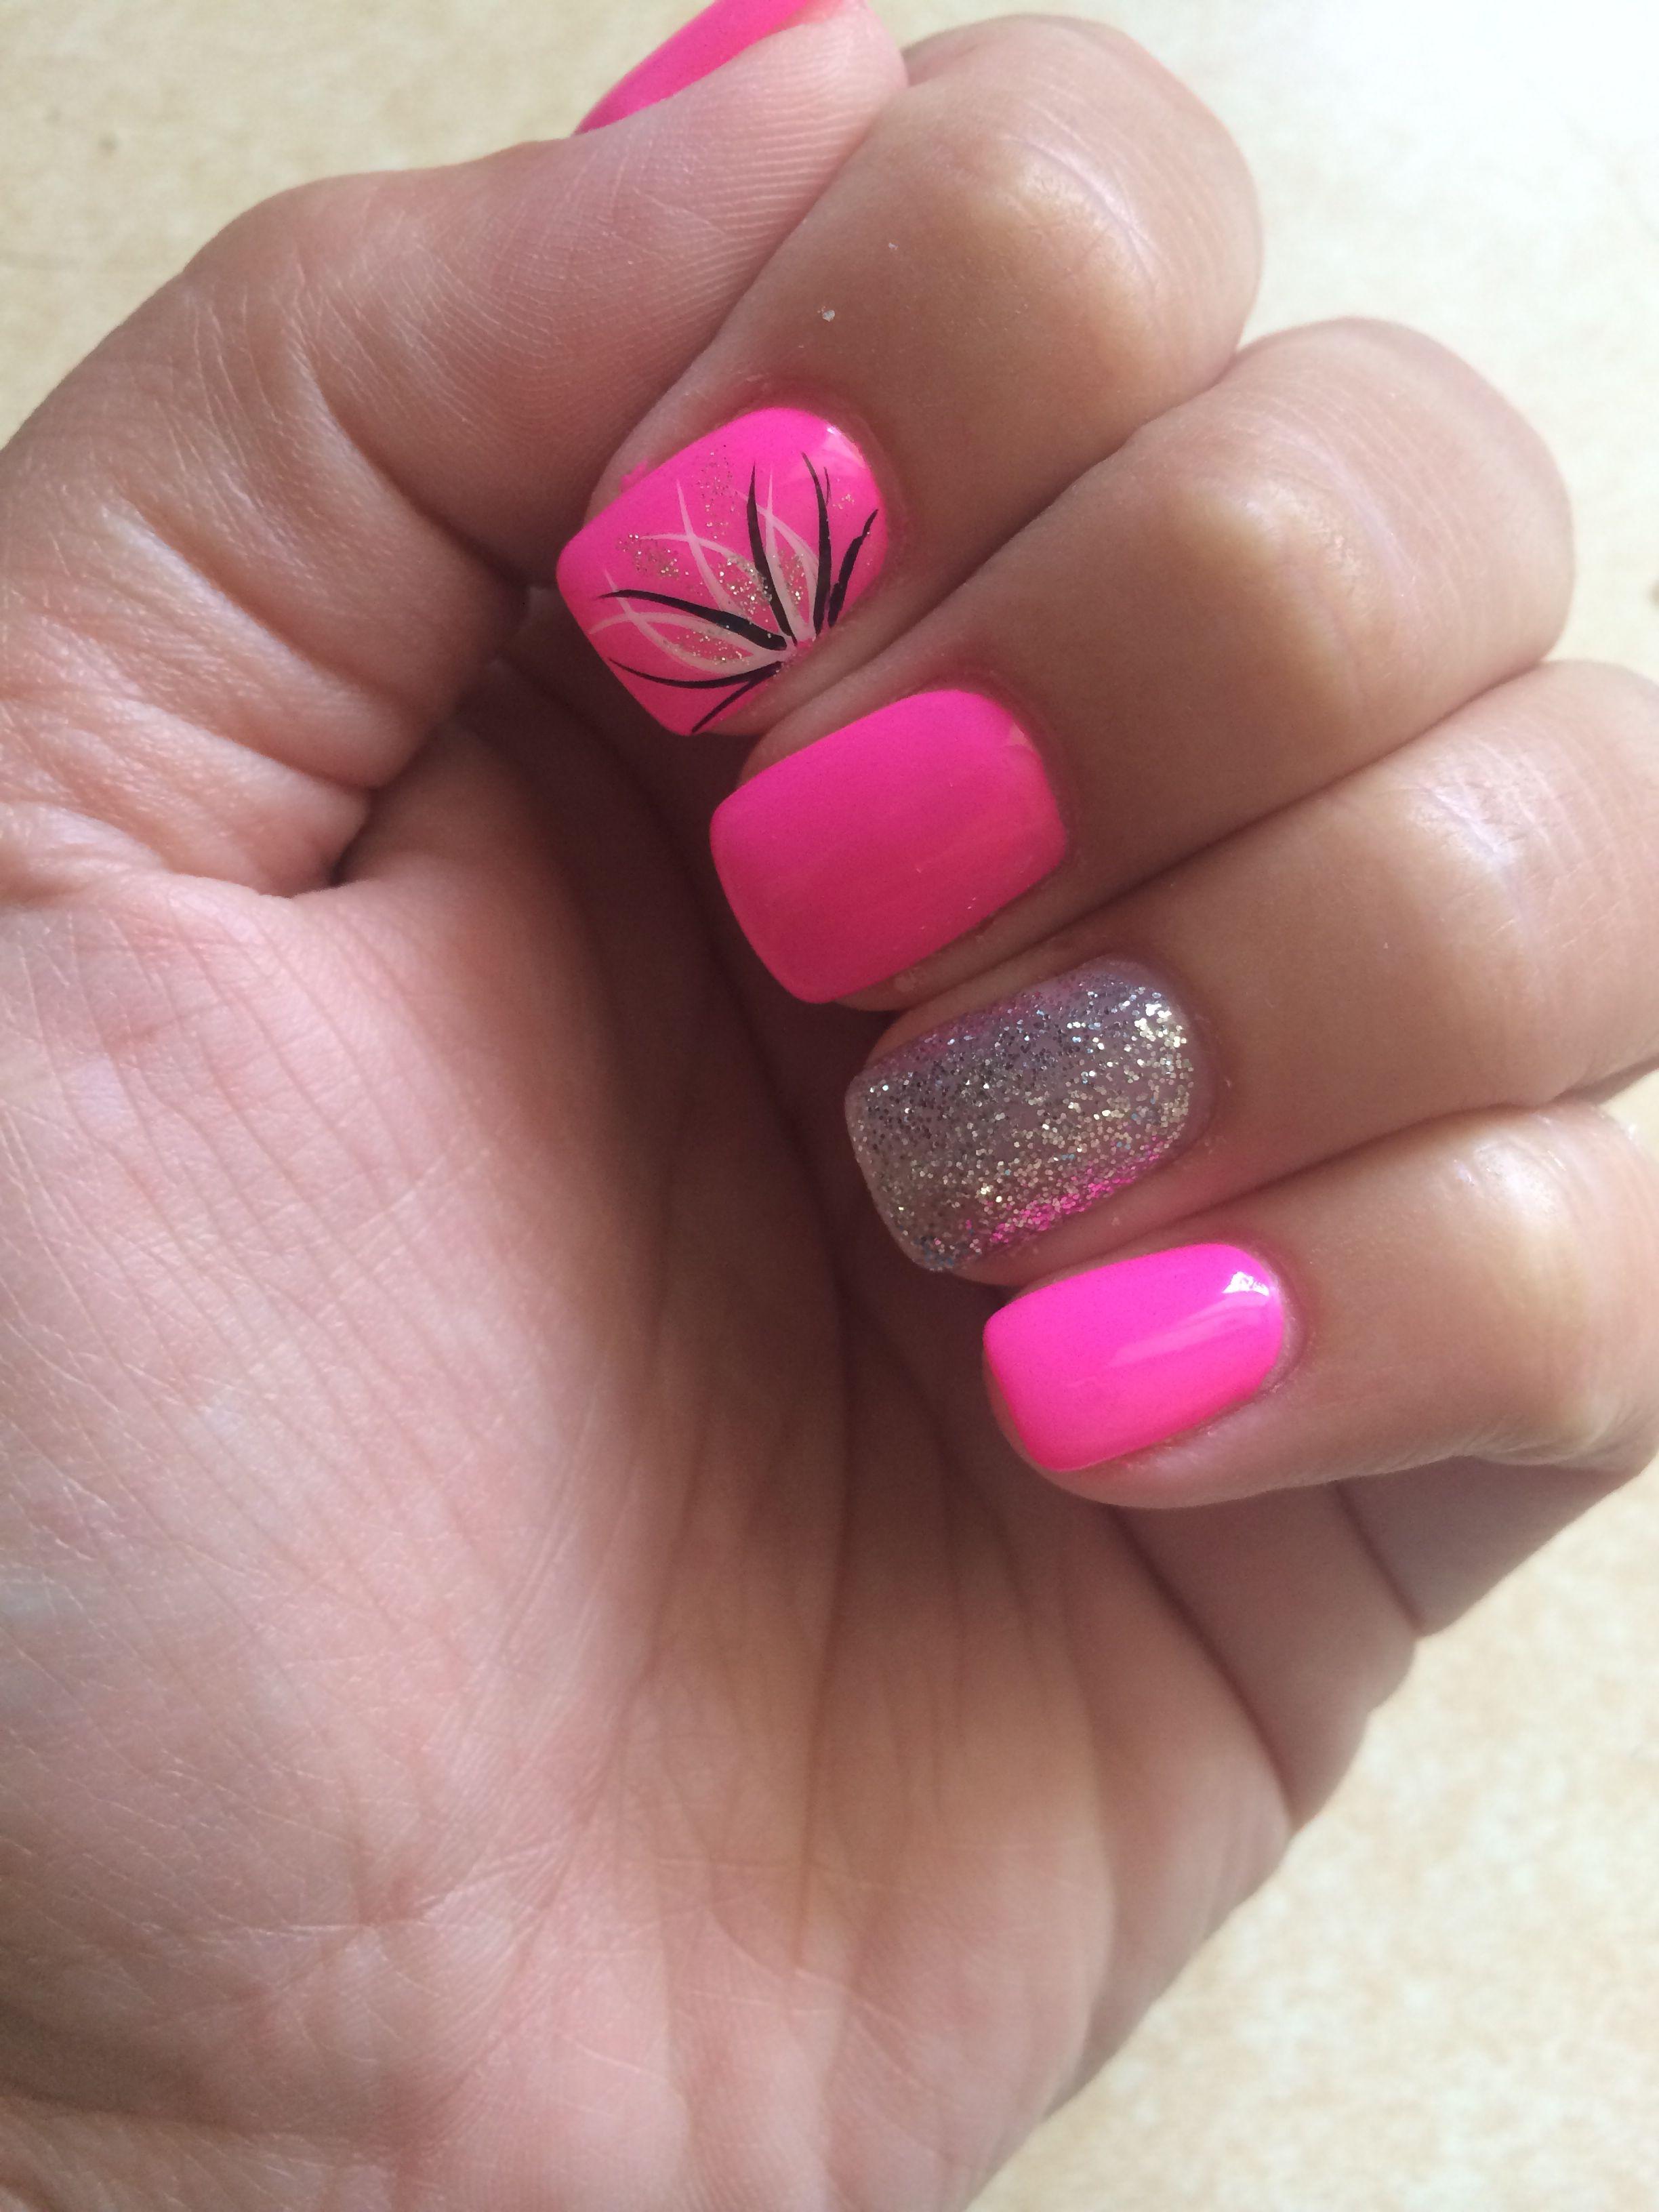 The Best Nails For This Season Luminous Nails Bright Pink Nails Halloween Nails Diy